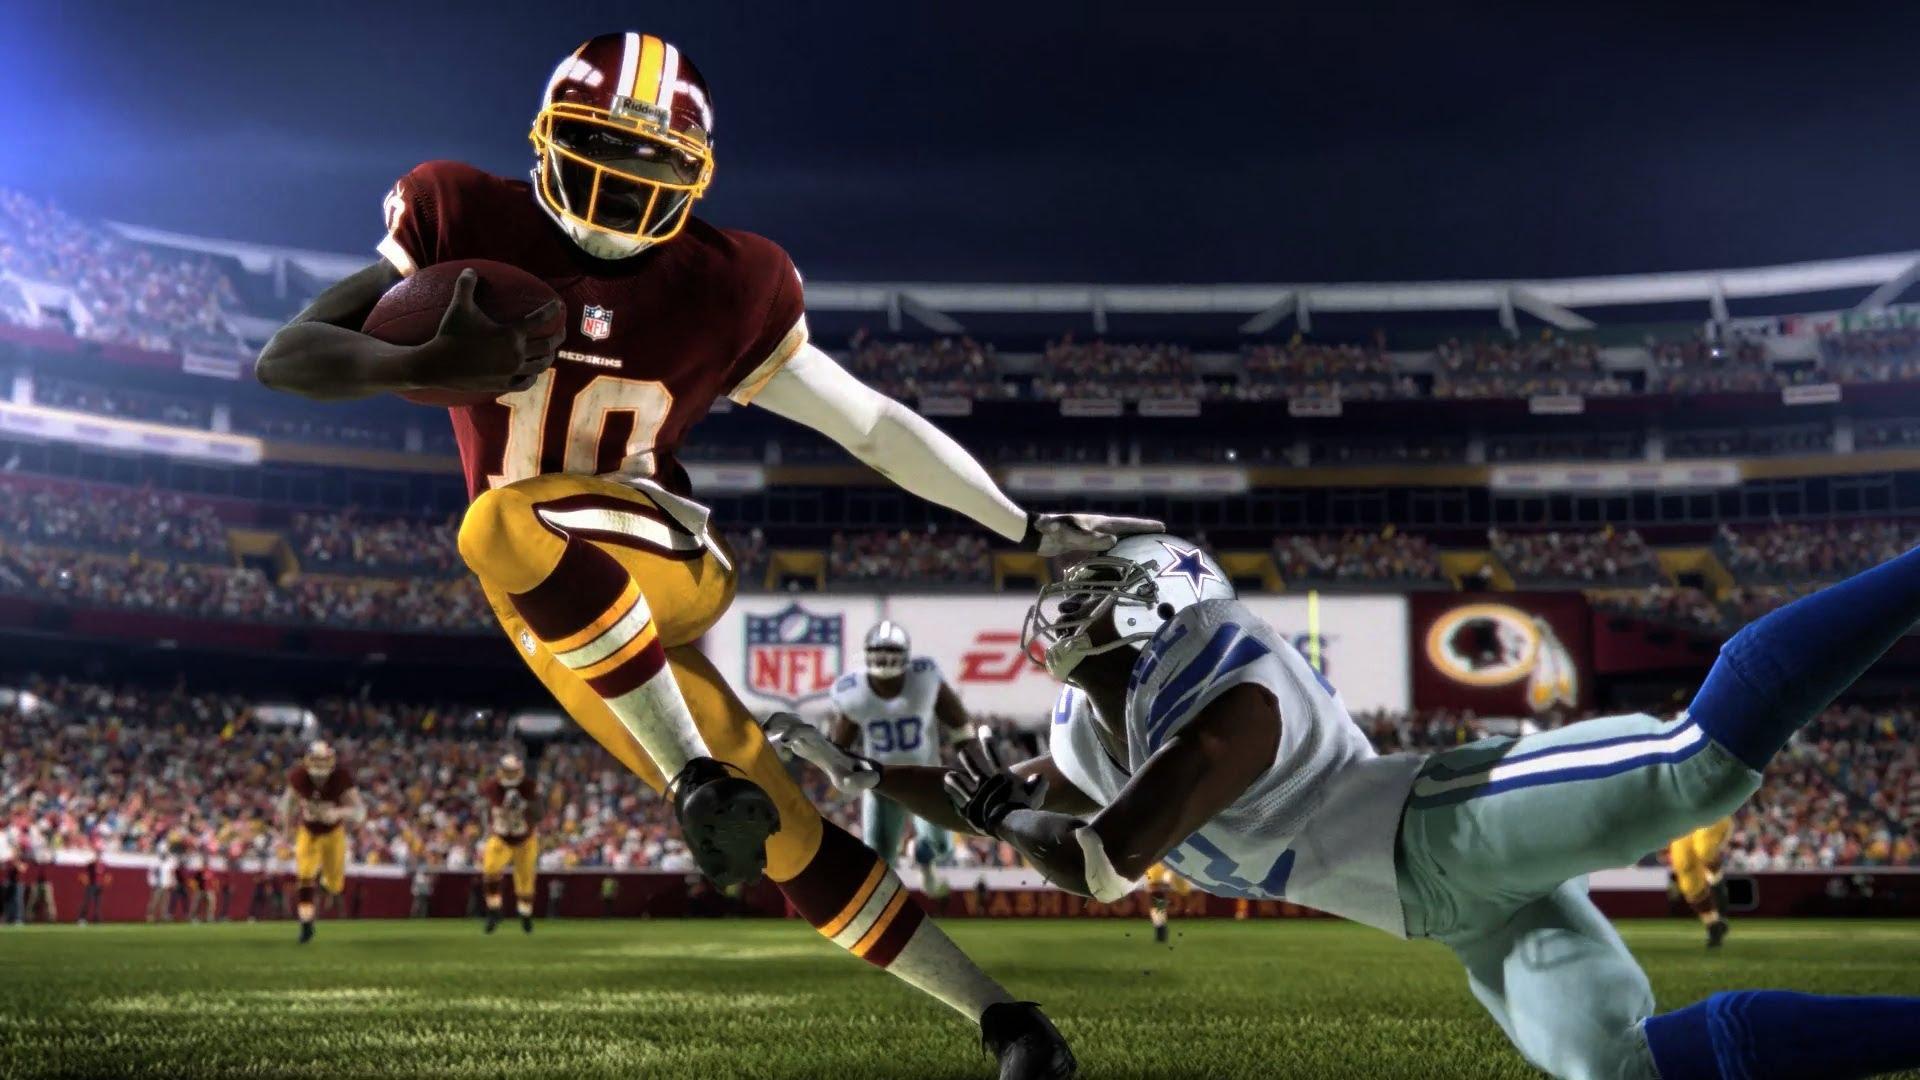 Madden NFL 16 HD Wallpaper Background Image 1920x1080 ID 1920x1080